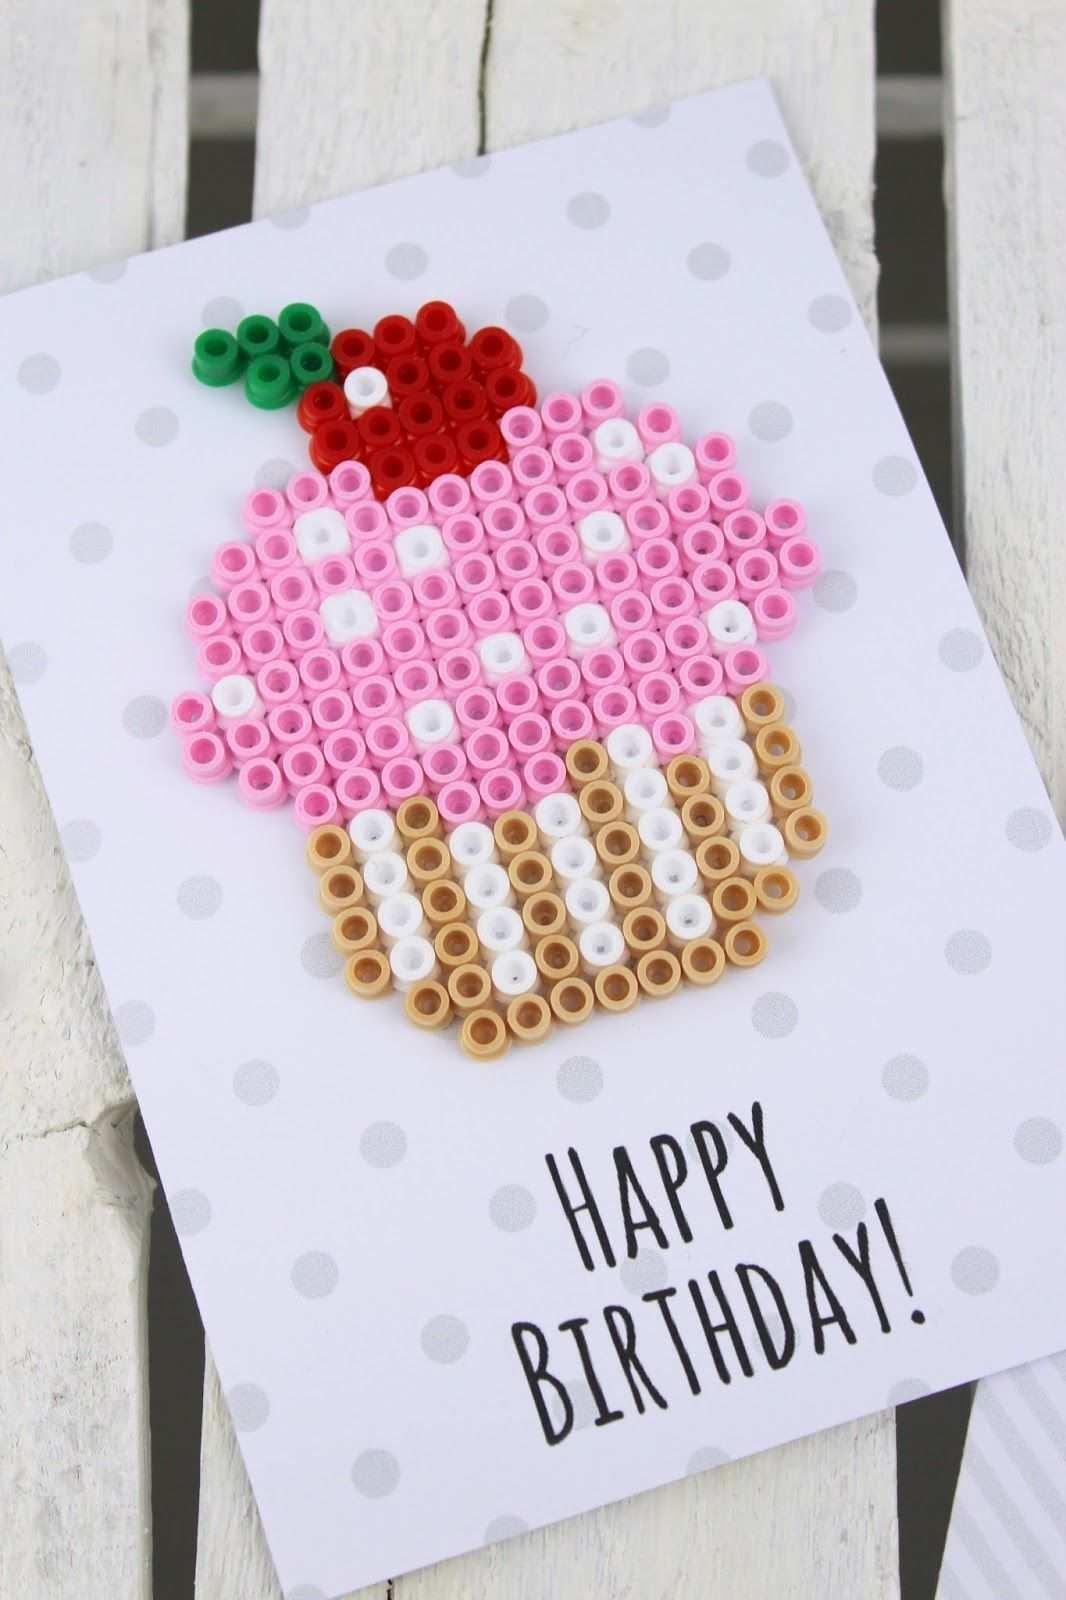 Diy Geburtstagkarten Aus Bugelperlen Selber Machen Geschenkidee Geburtstagkarten Basteln Geburtstagsgeschenke Basteln Mit Kindern Geschenke